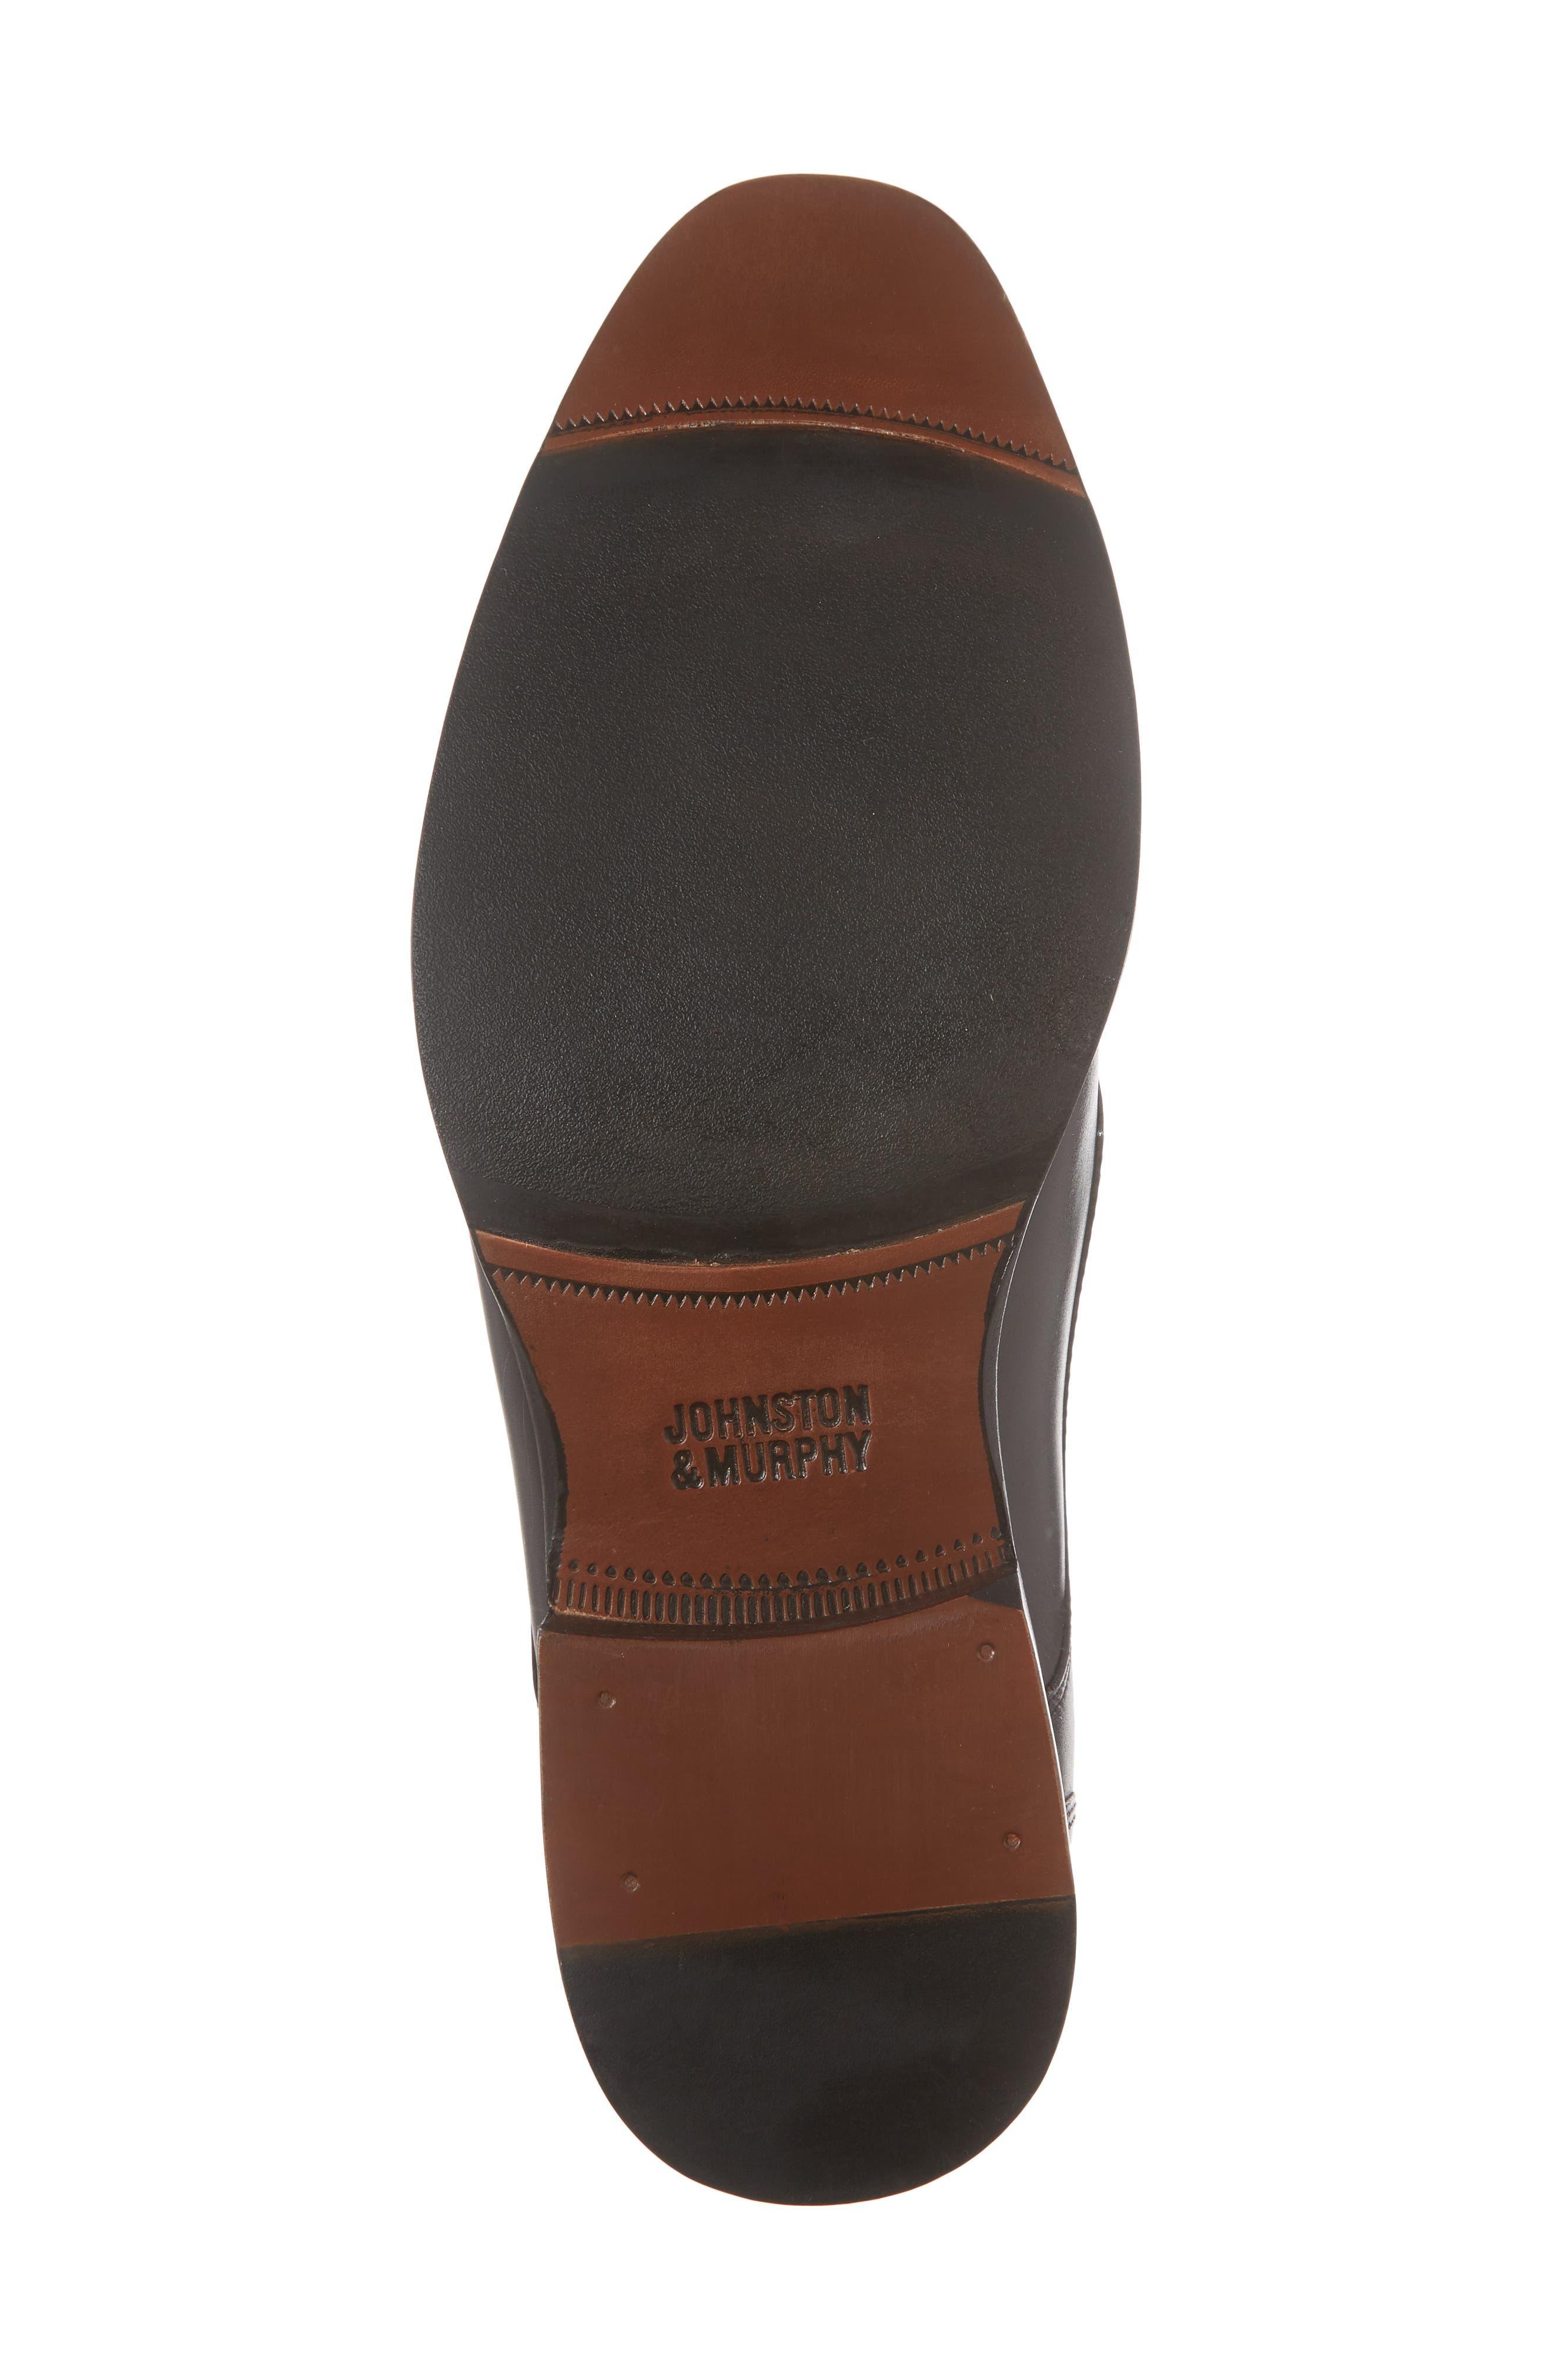 McClain Runoff Bike Toe Slip-On,                             Alternate thumbnail 6, color,                             Black Leather